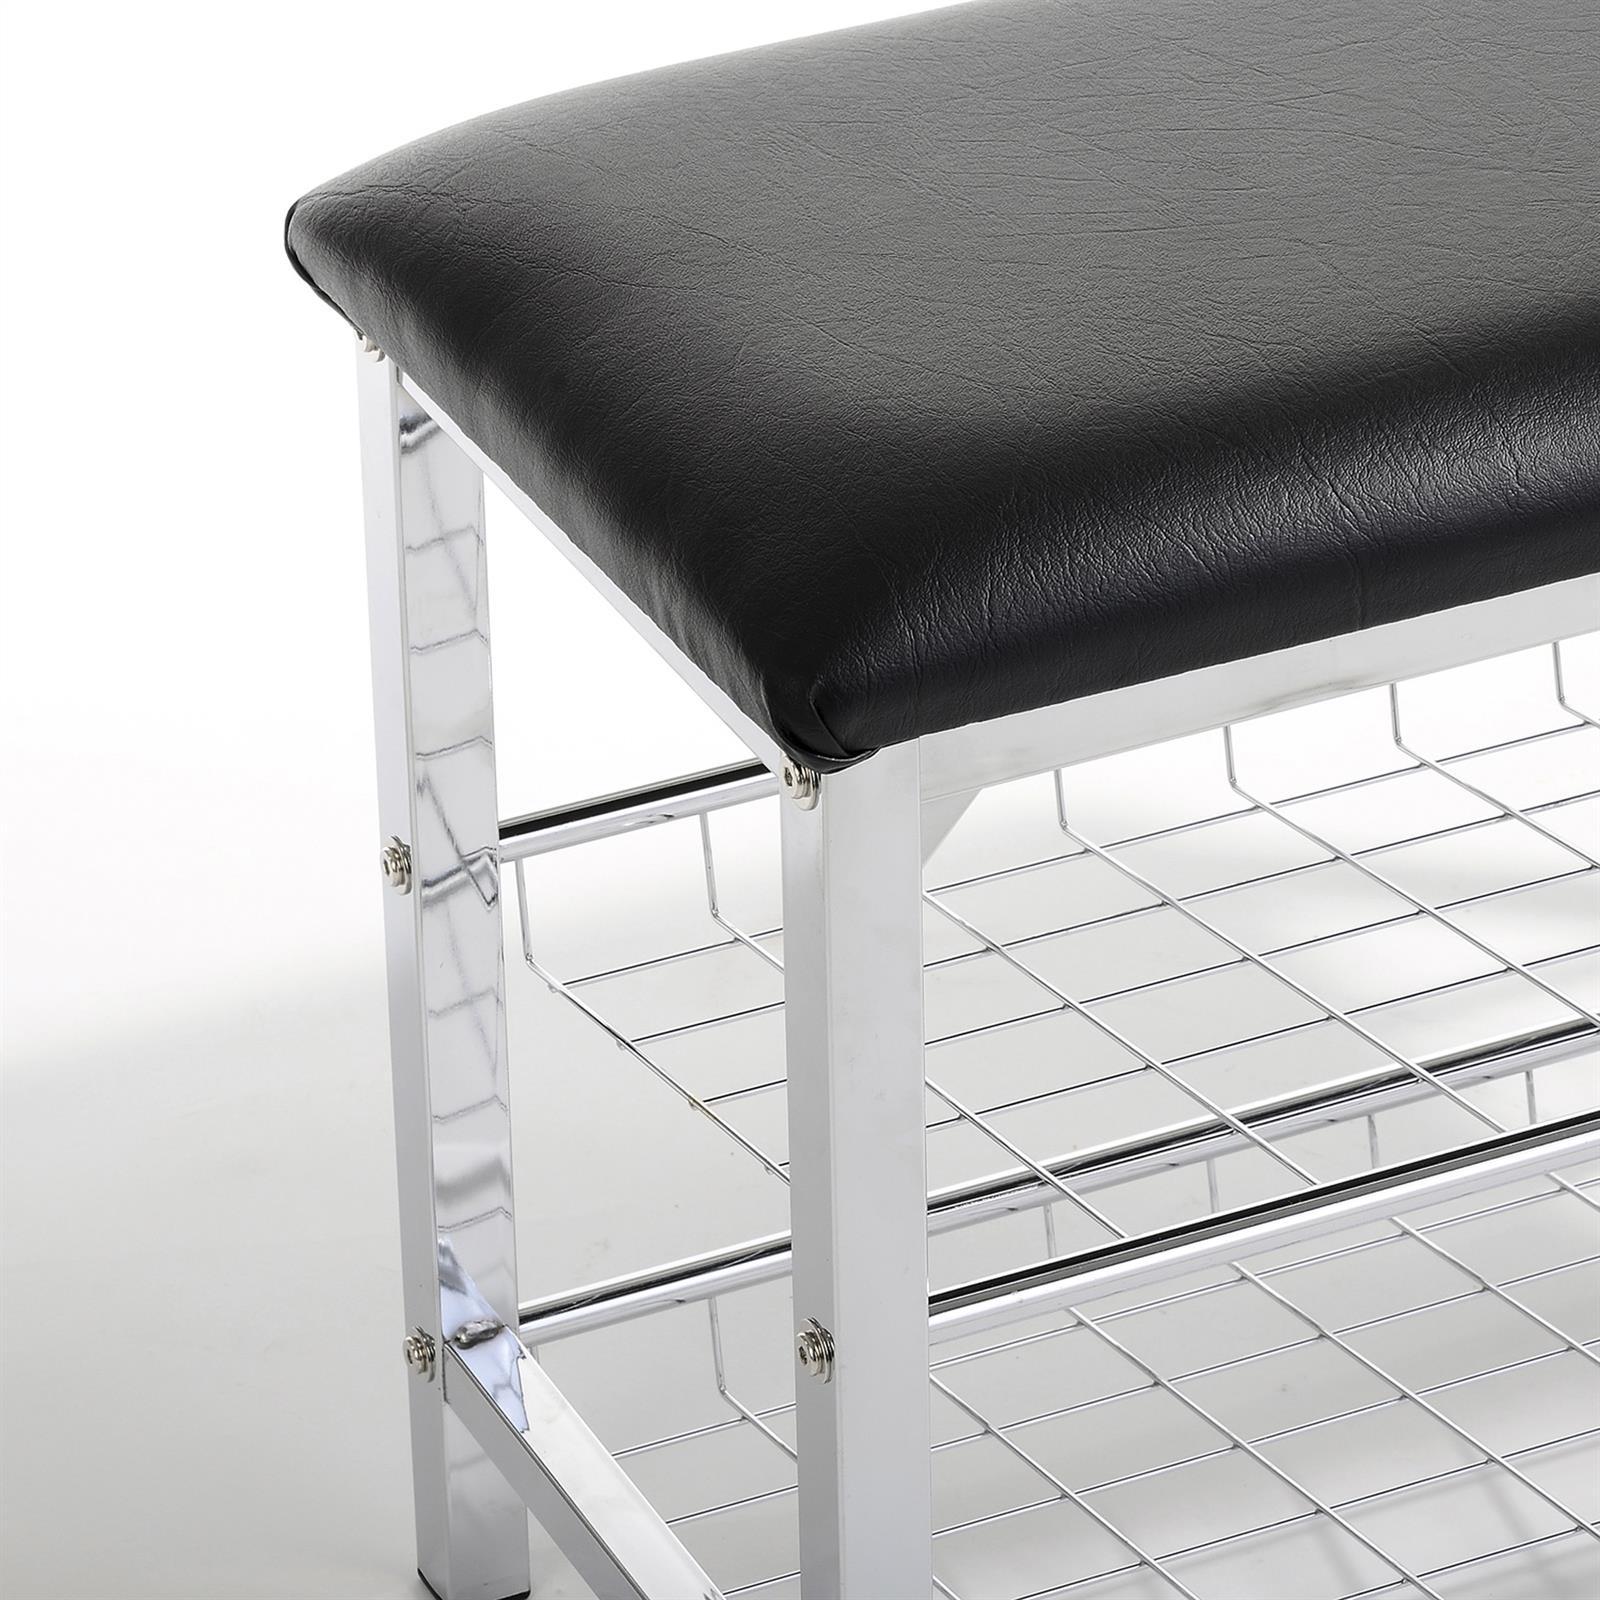 sitzbank mit schuhregal ina schwarz mobilia24. Black Bedroom Furniture Sets. Home Design Ideas